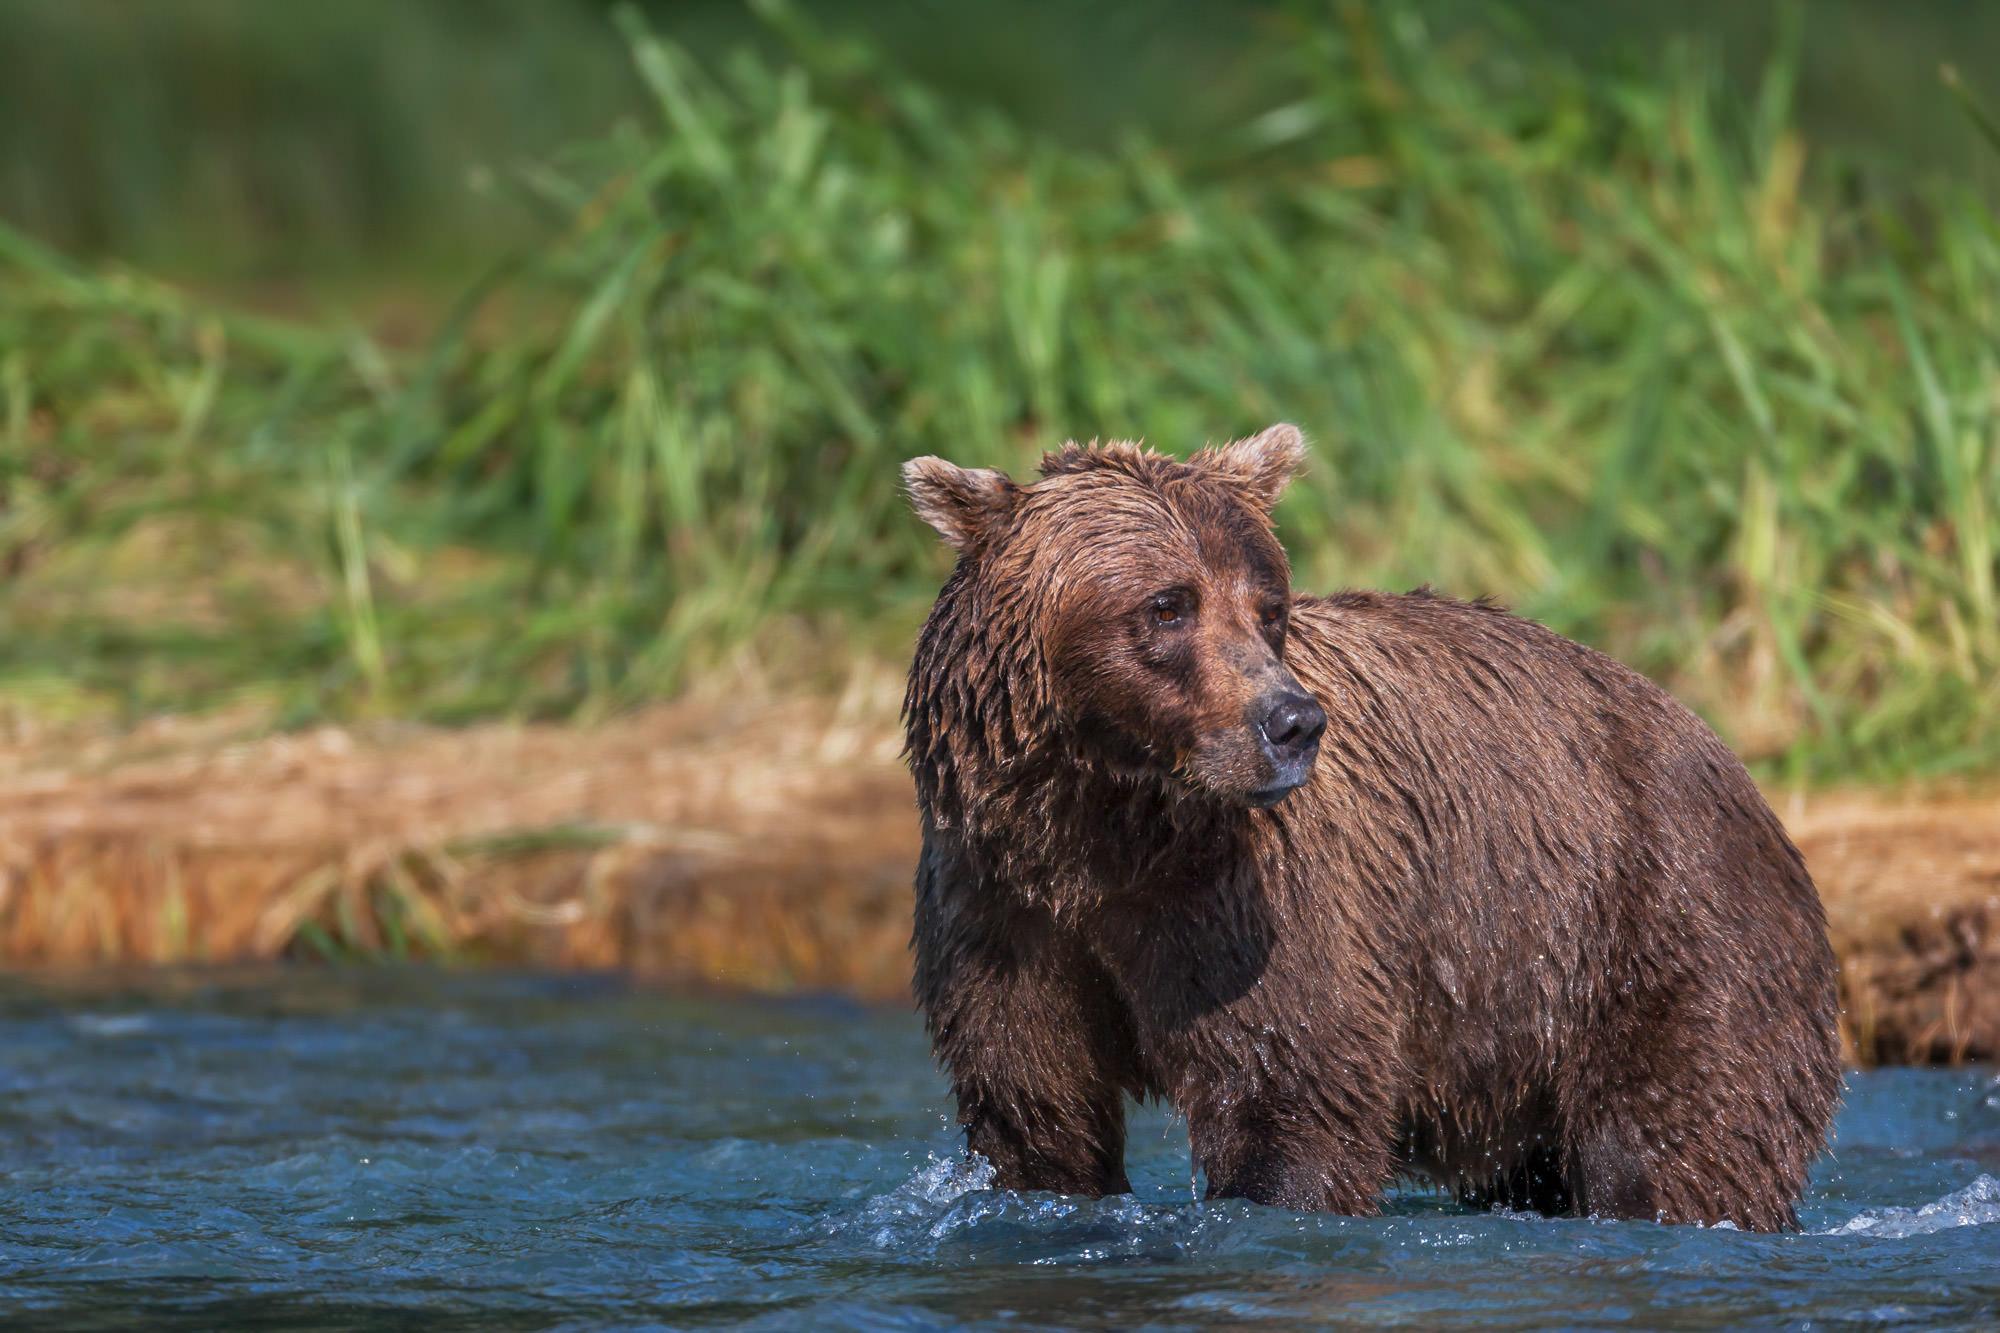 Bear, Brown Bear, Grizzly Bear, Fishing, Salmon, Alaska, photo